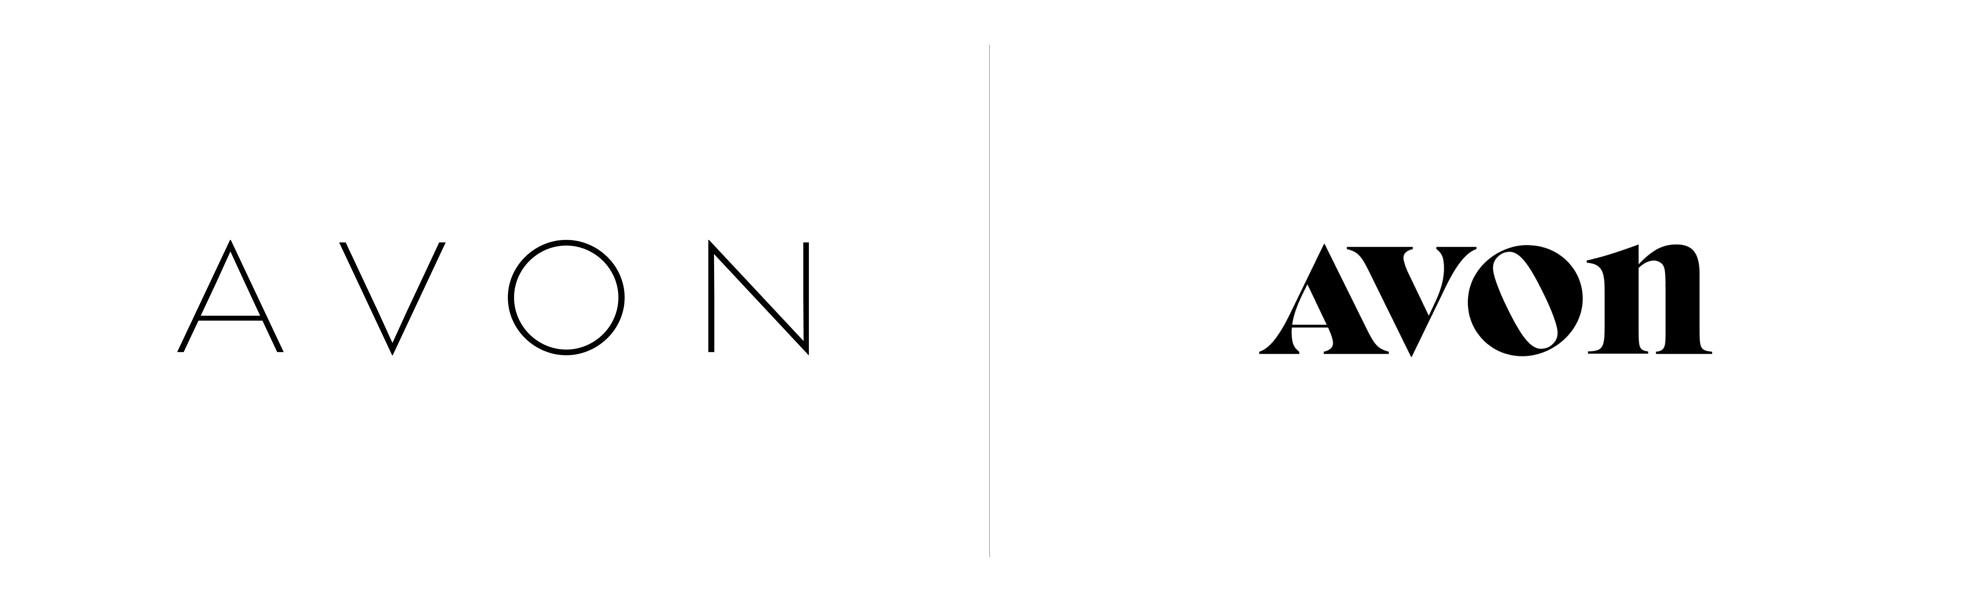 Avon zmienia logo wUSA